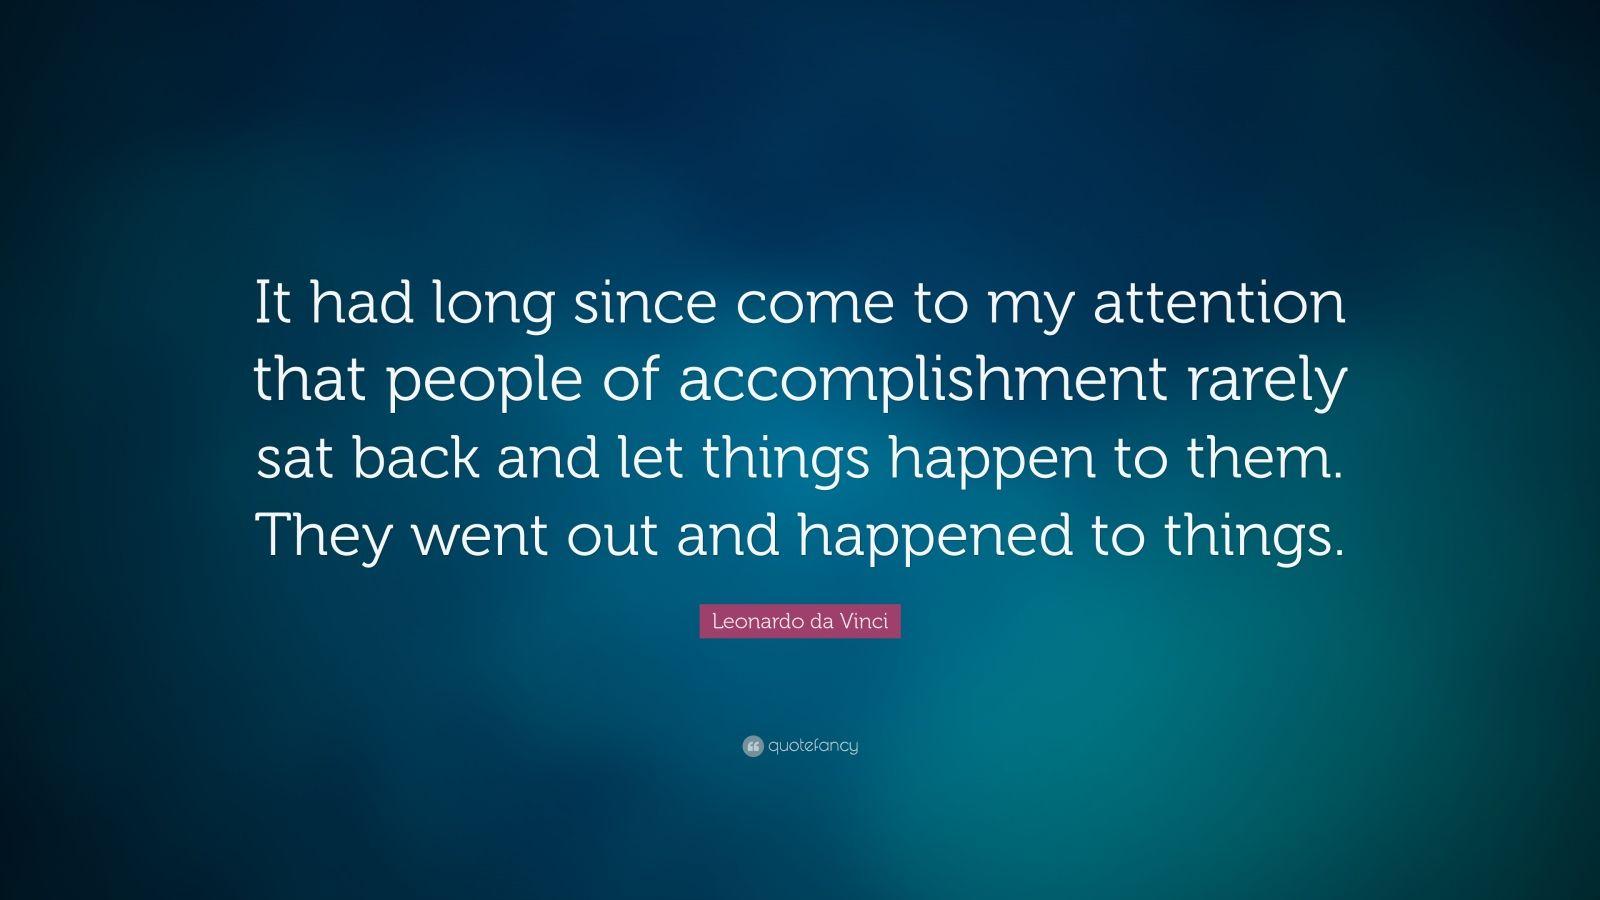 Vincent Van Gogh Quotes Wallpaper Leonardo Da Vinci Quote It Had Long Since Come To My